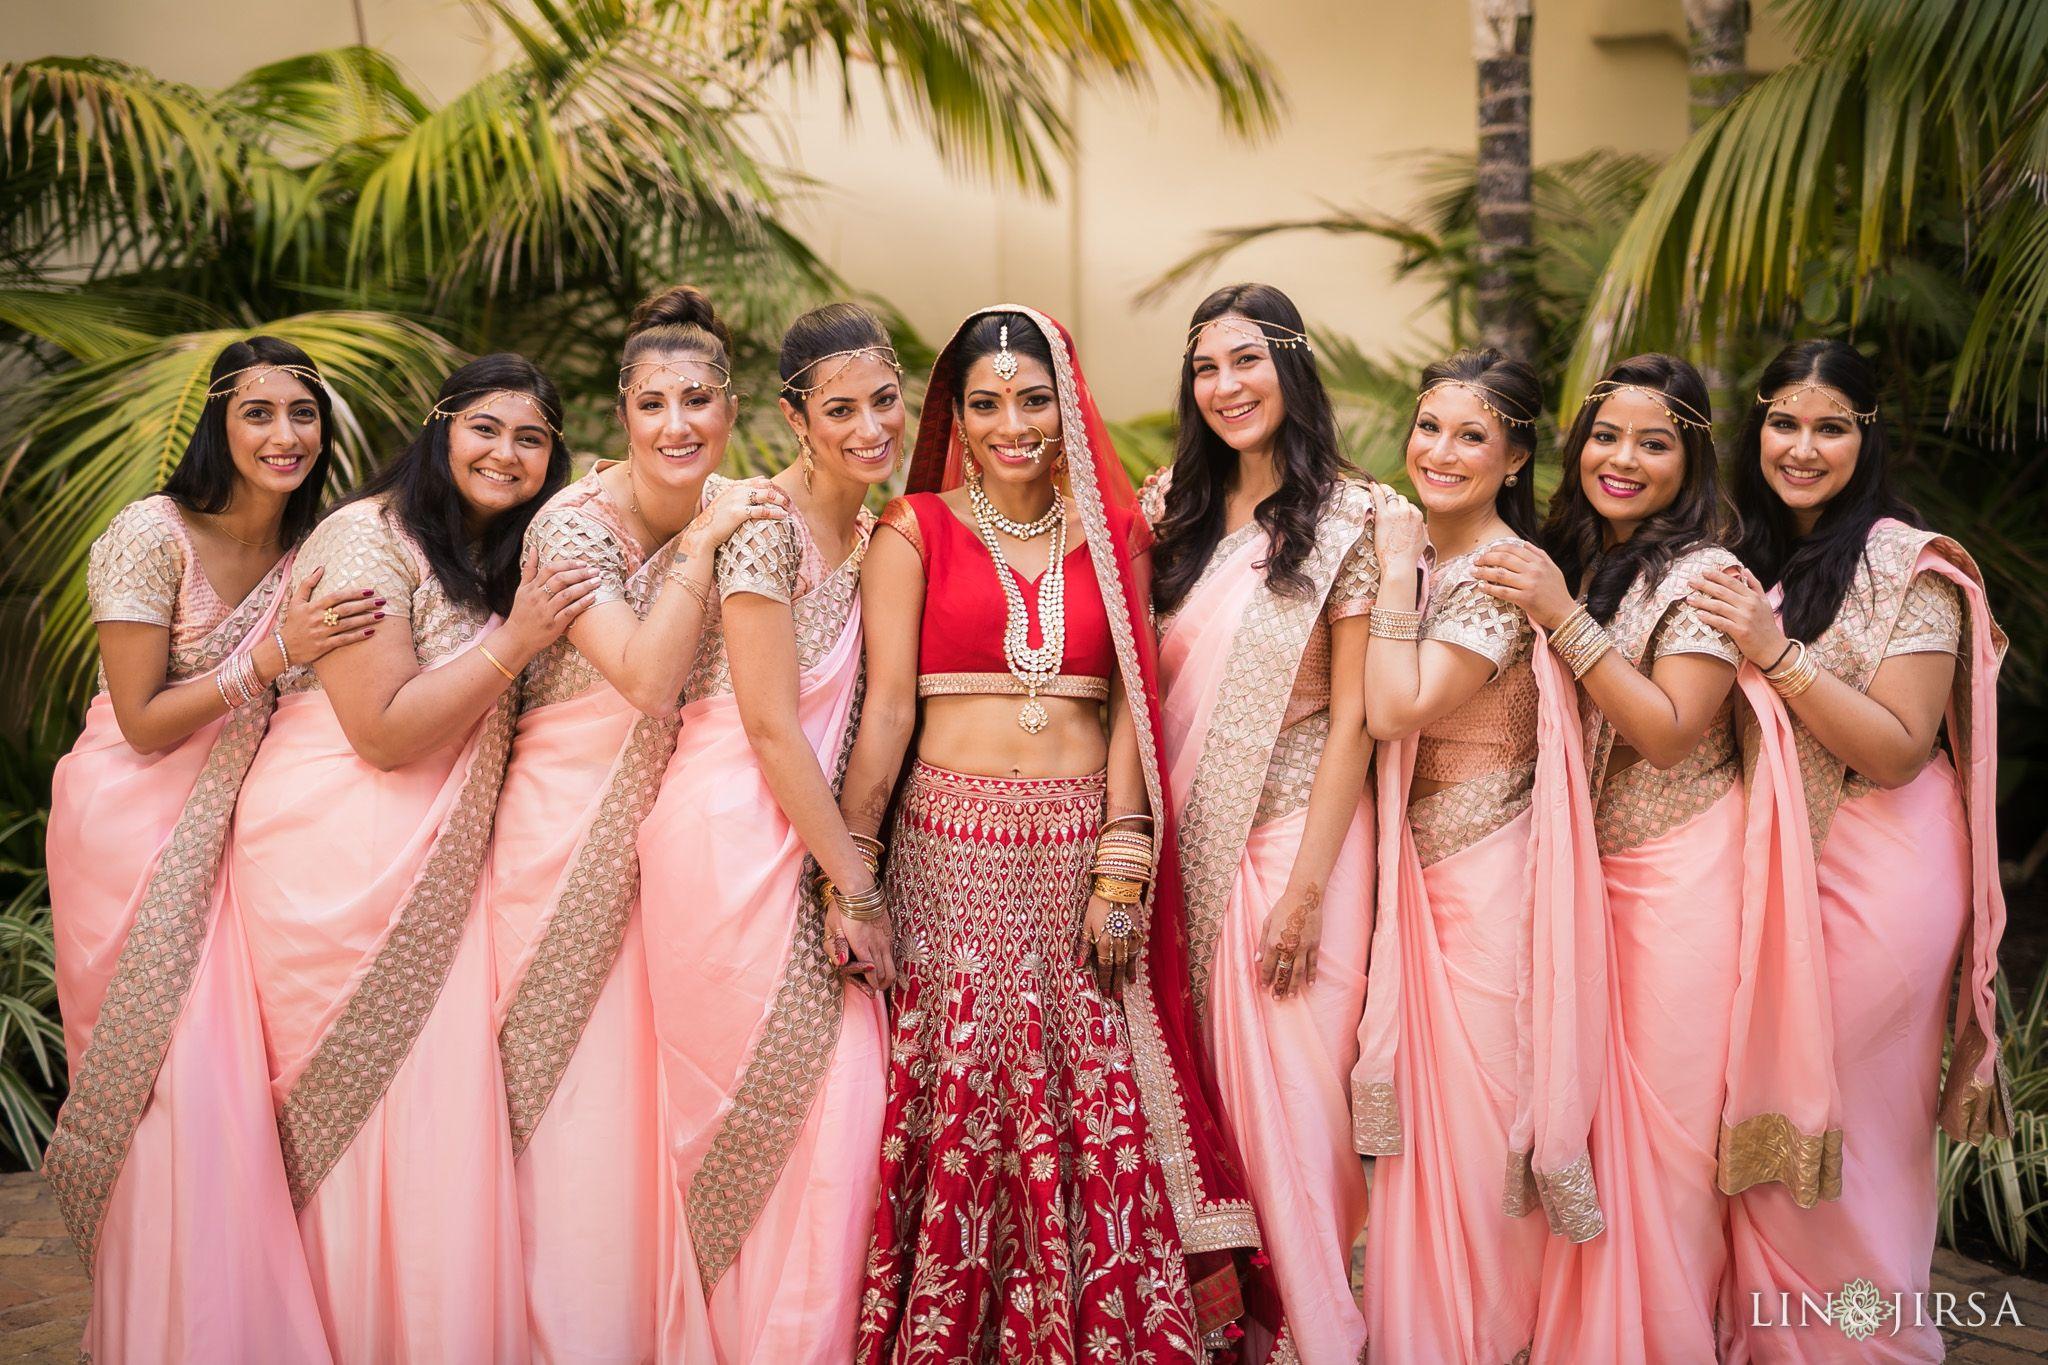 Khusbu Rajeev Wedding Preview Indian Bridesmaids Indian Bridesmaid Dresses Indian Wedding Bridesmaids,Wedding Guest Petite Cocktail Dresses For Wedding